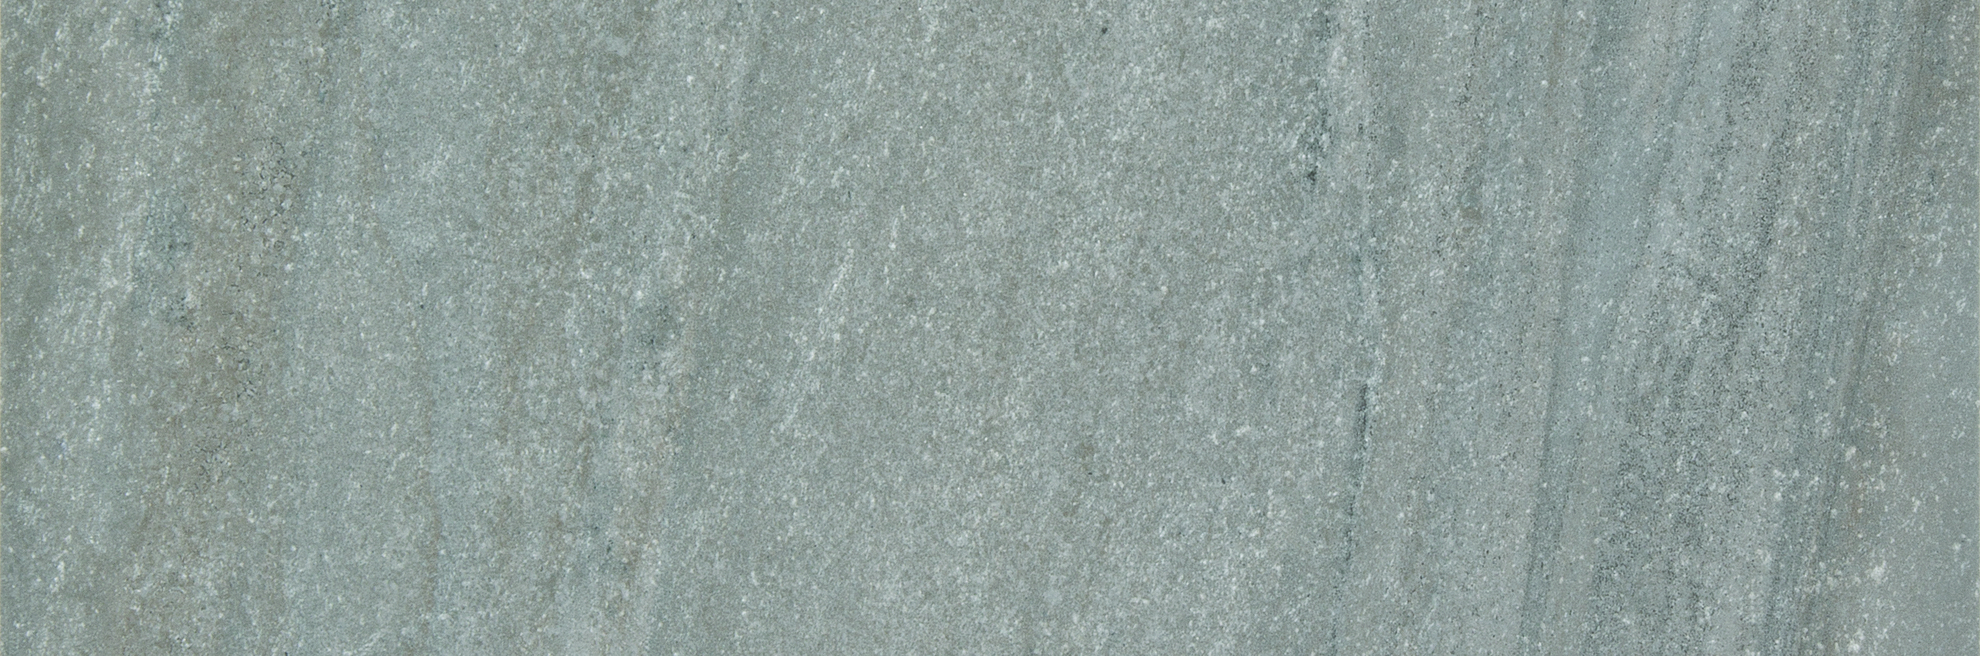 60x120 Pietra Pienza Tile Dark Grey Matt